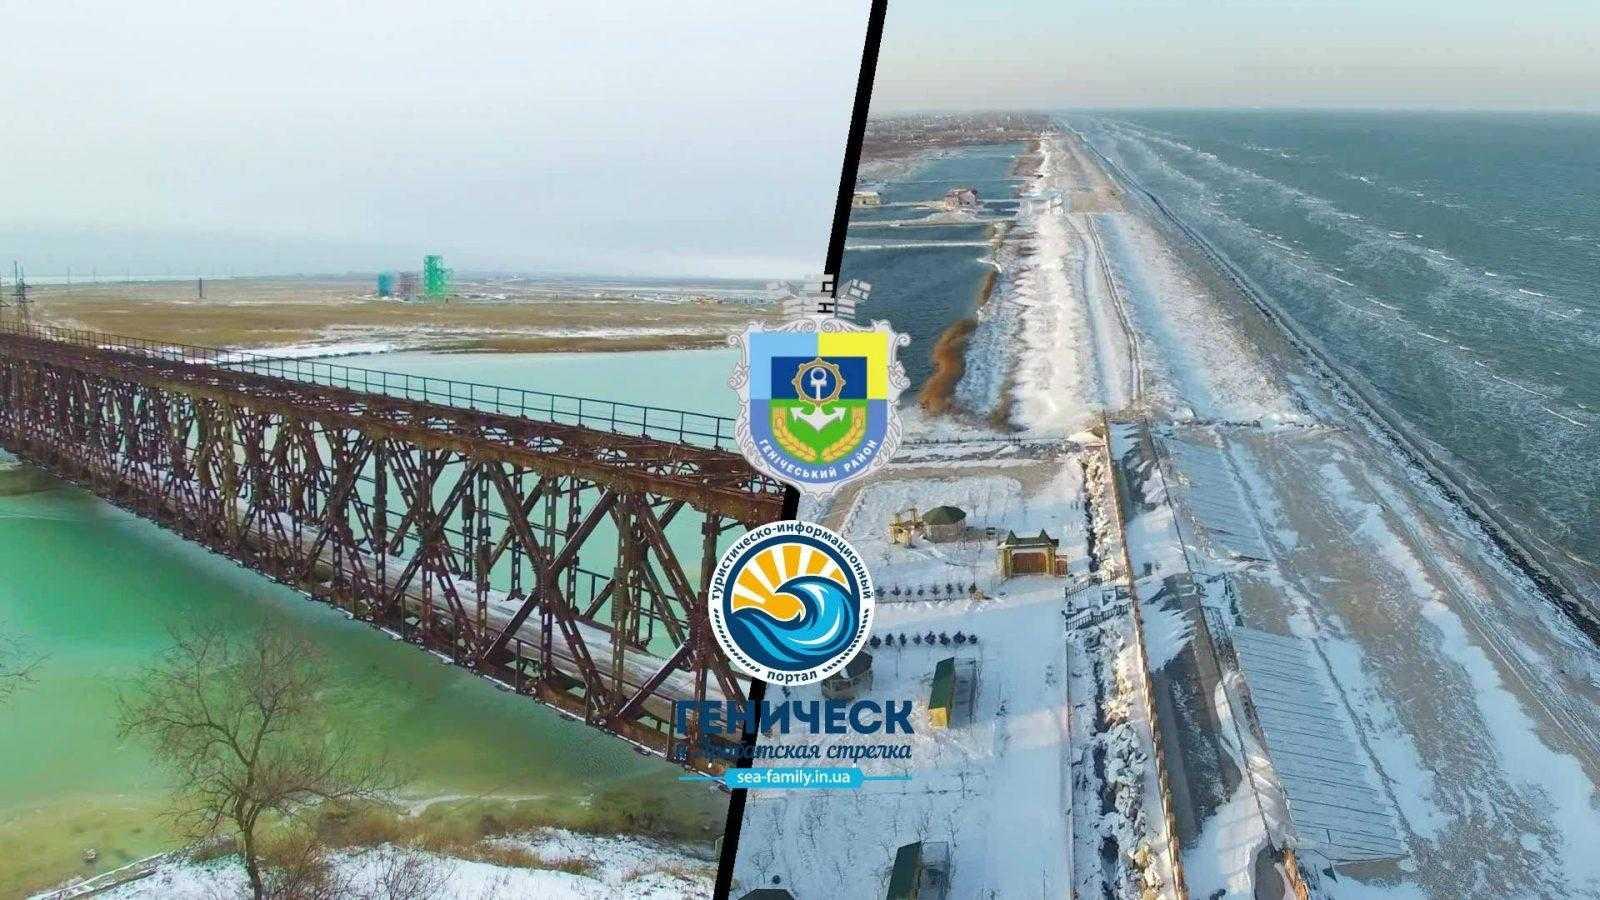 Henichesk and Arabatskaya strelka from the height of bird flight. Winter 2018